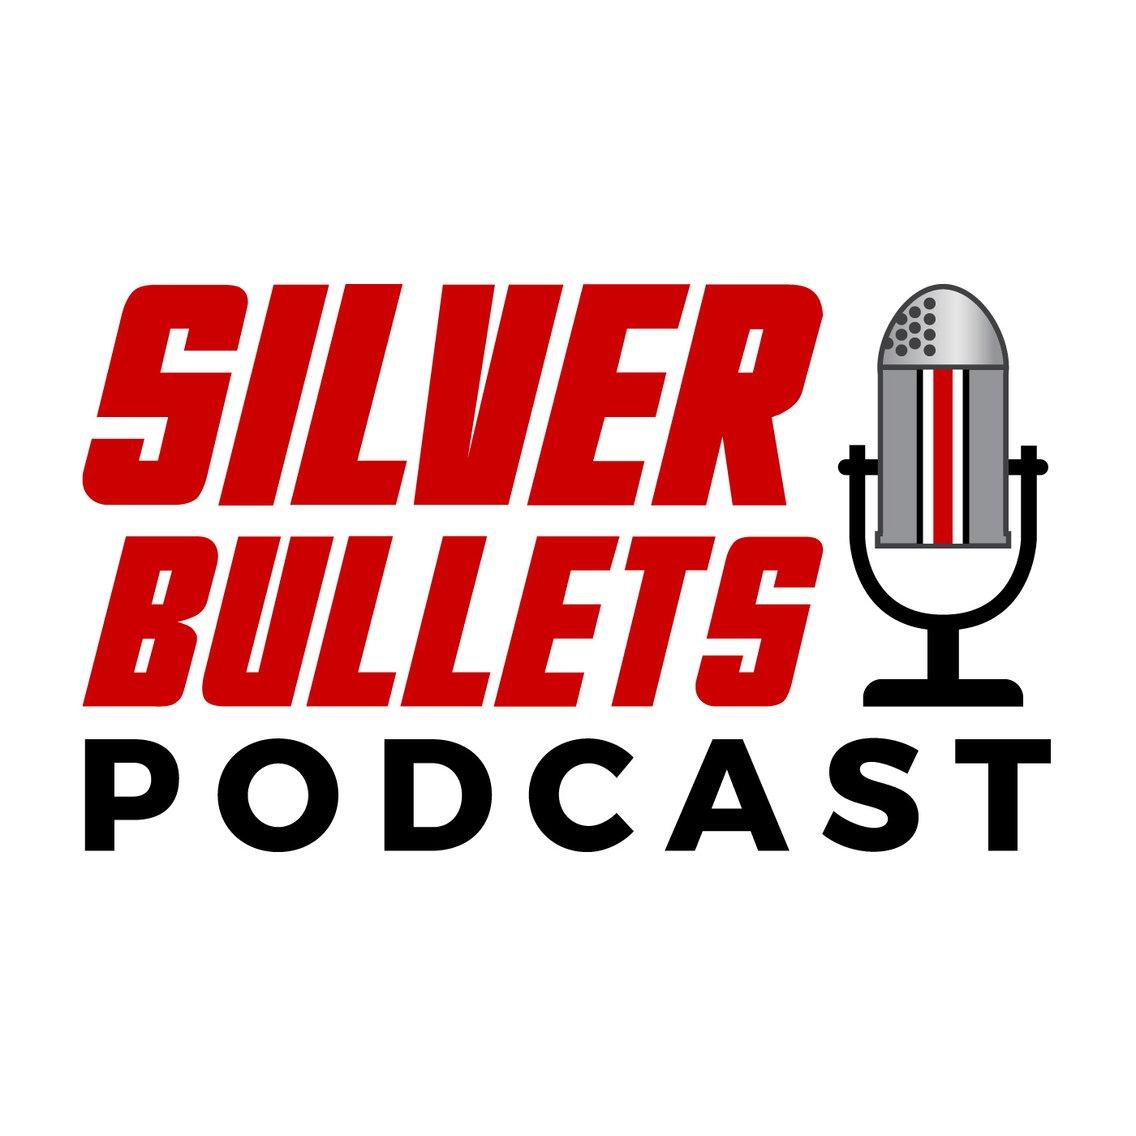 Silver Bullets Podcast - imagen de portada